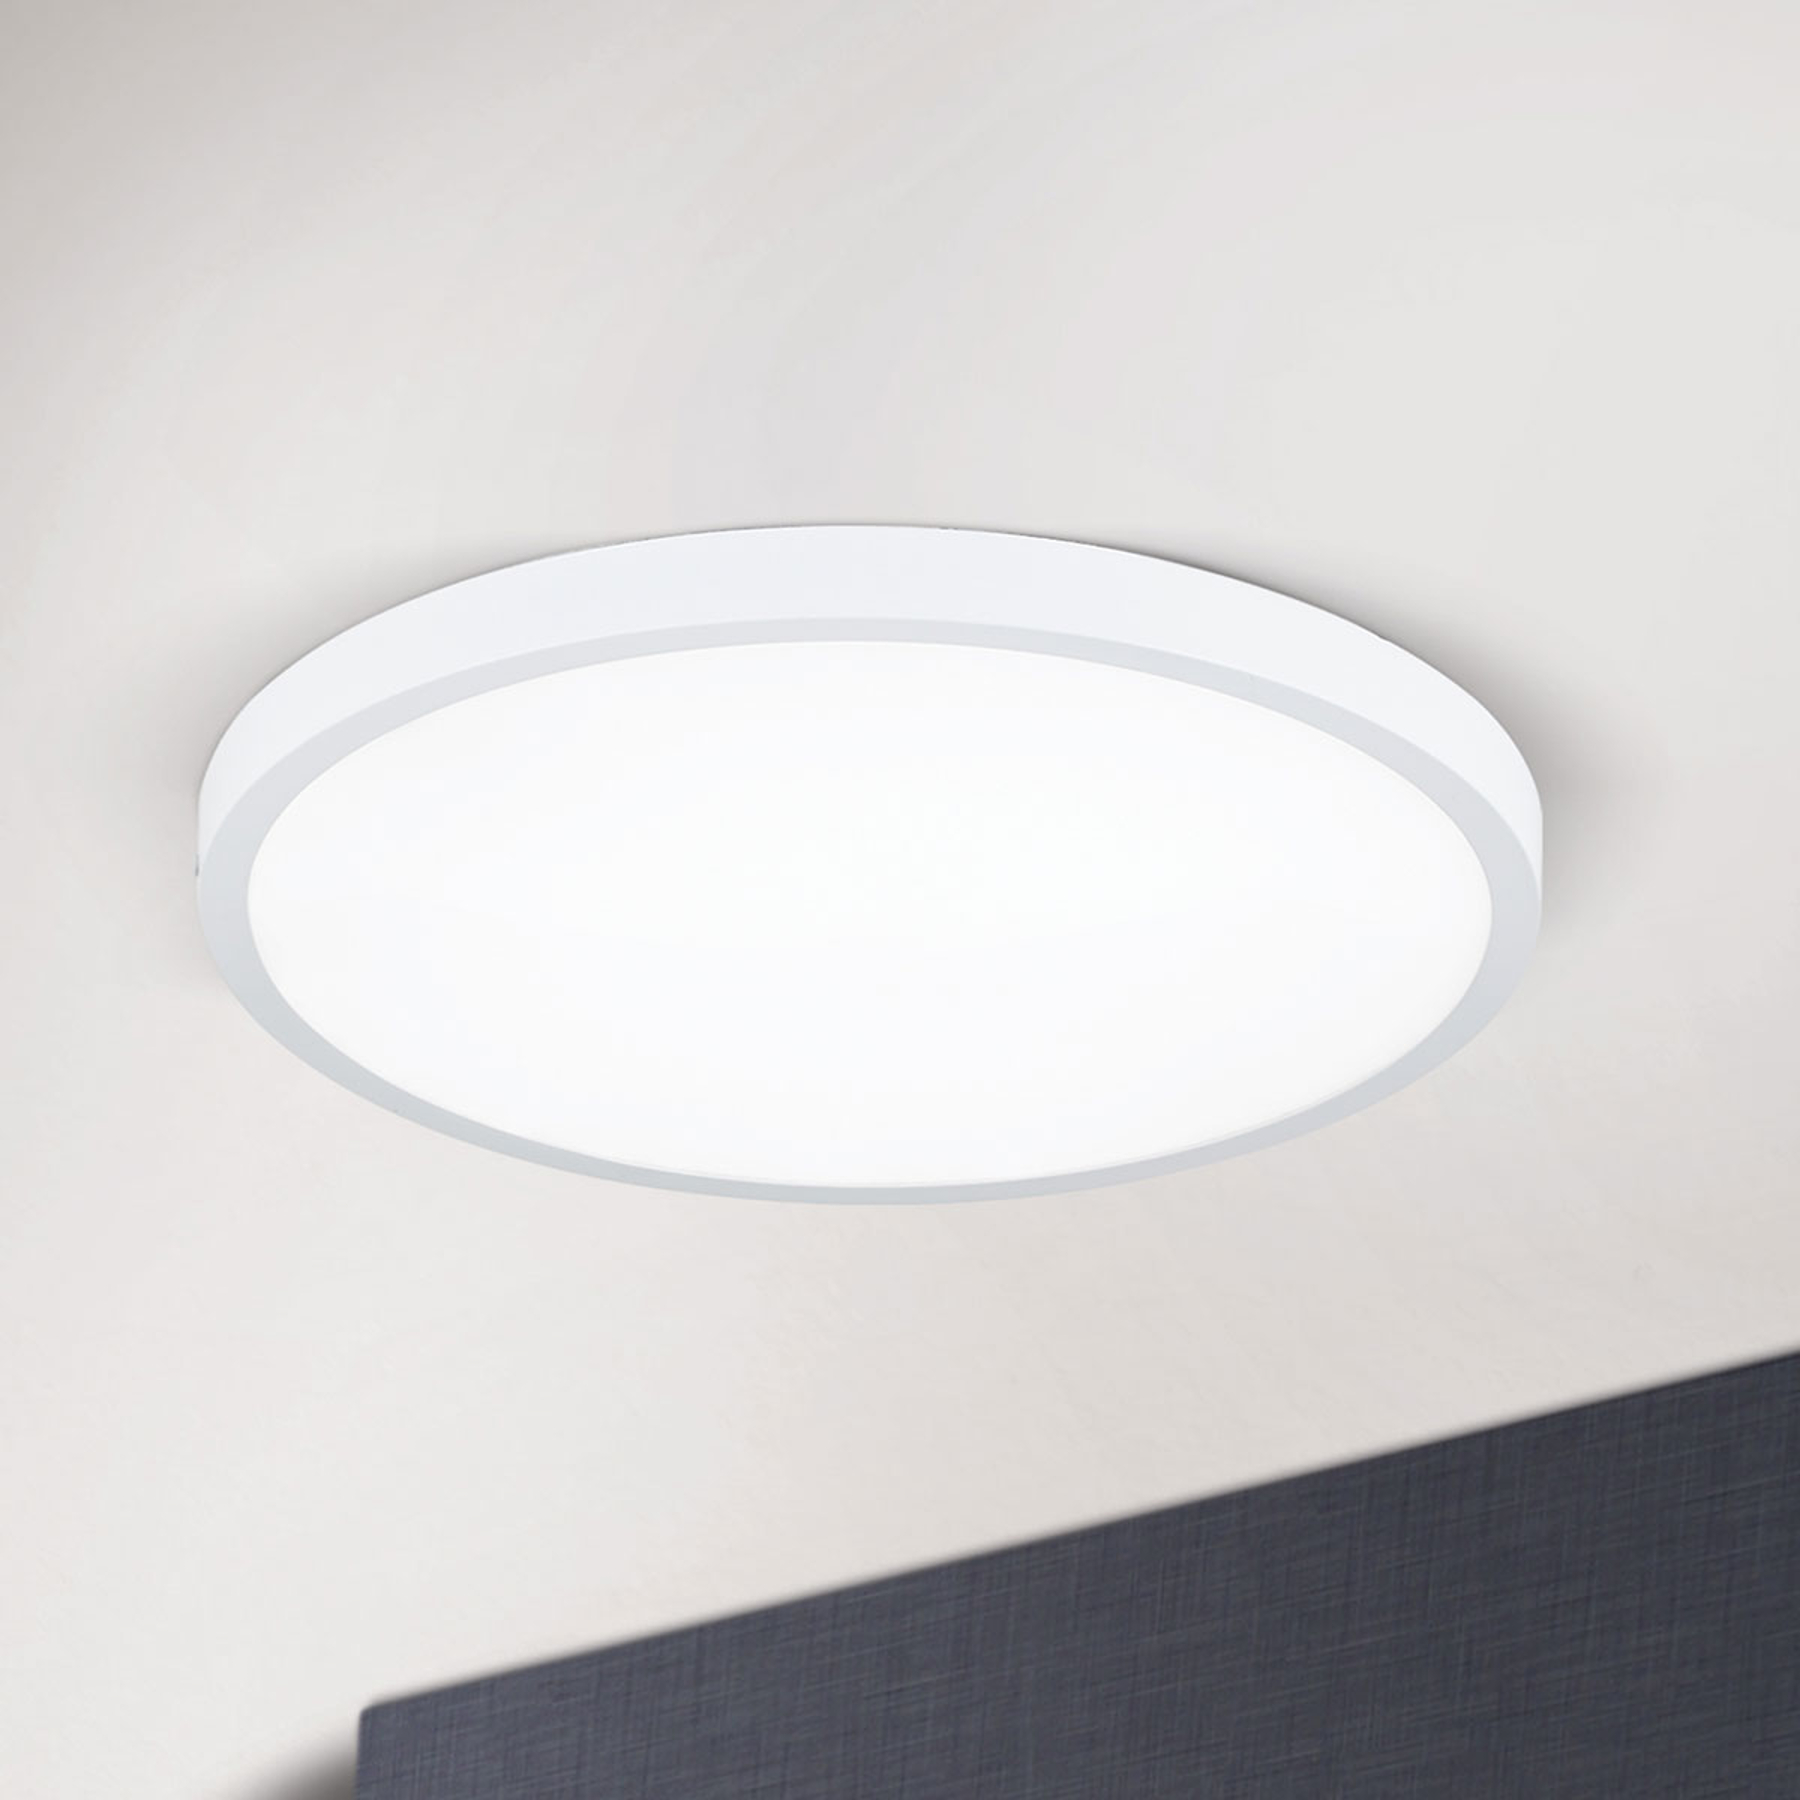 LED-kattovalaisin Lero Ø 40 cm